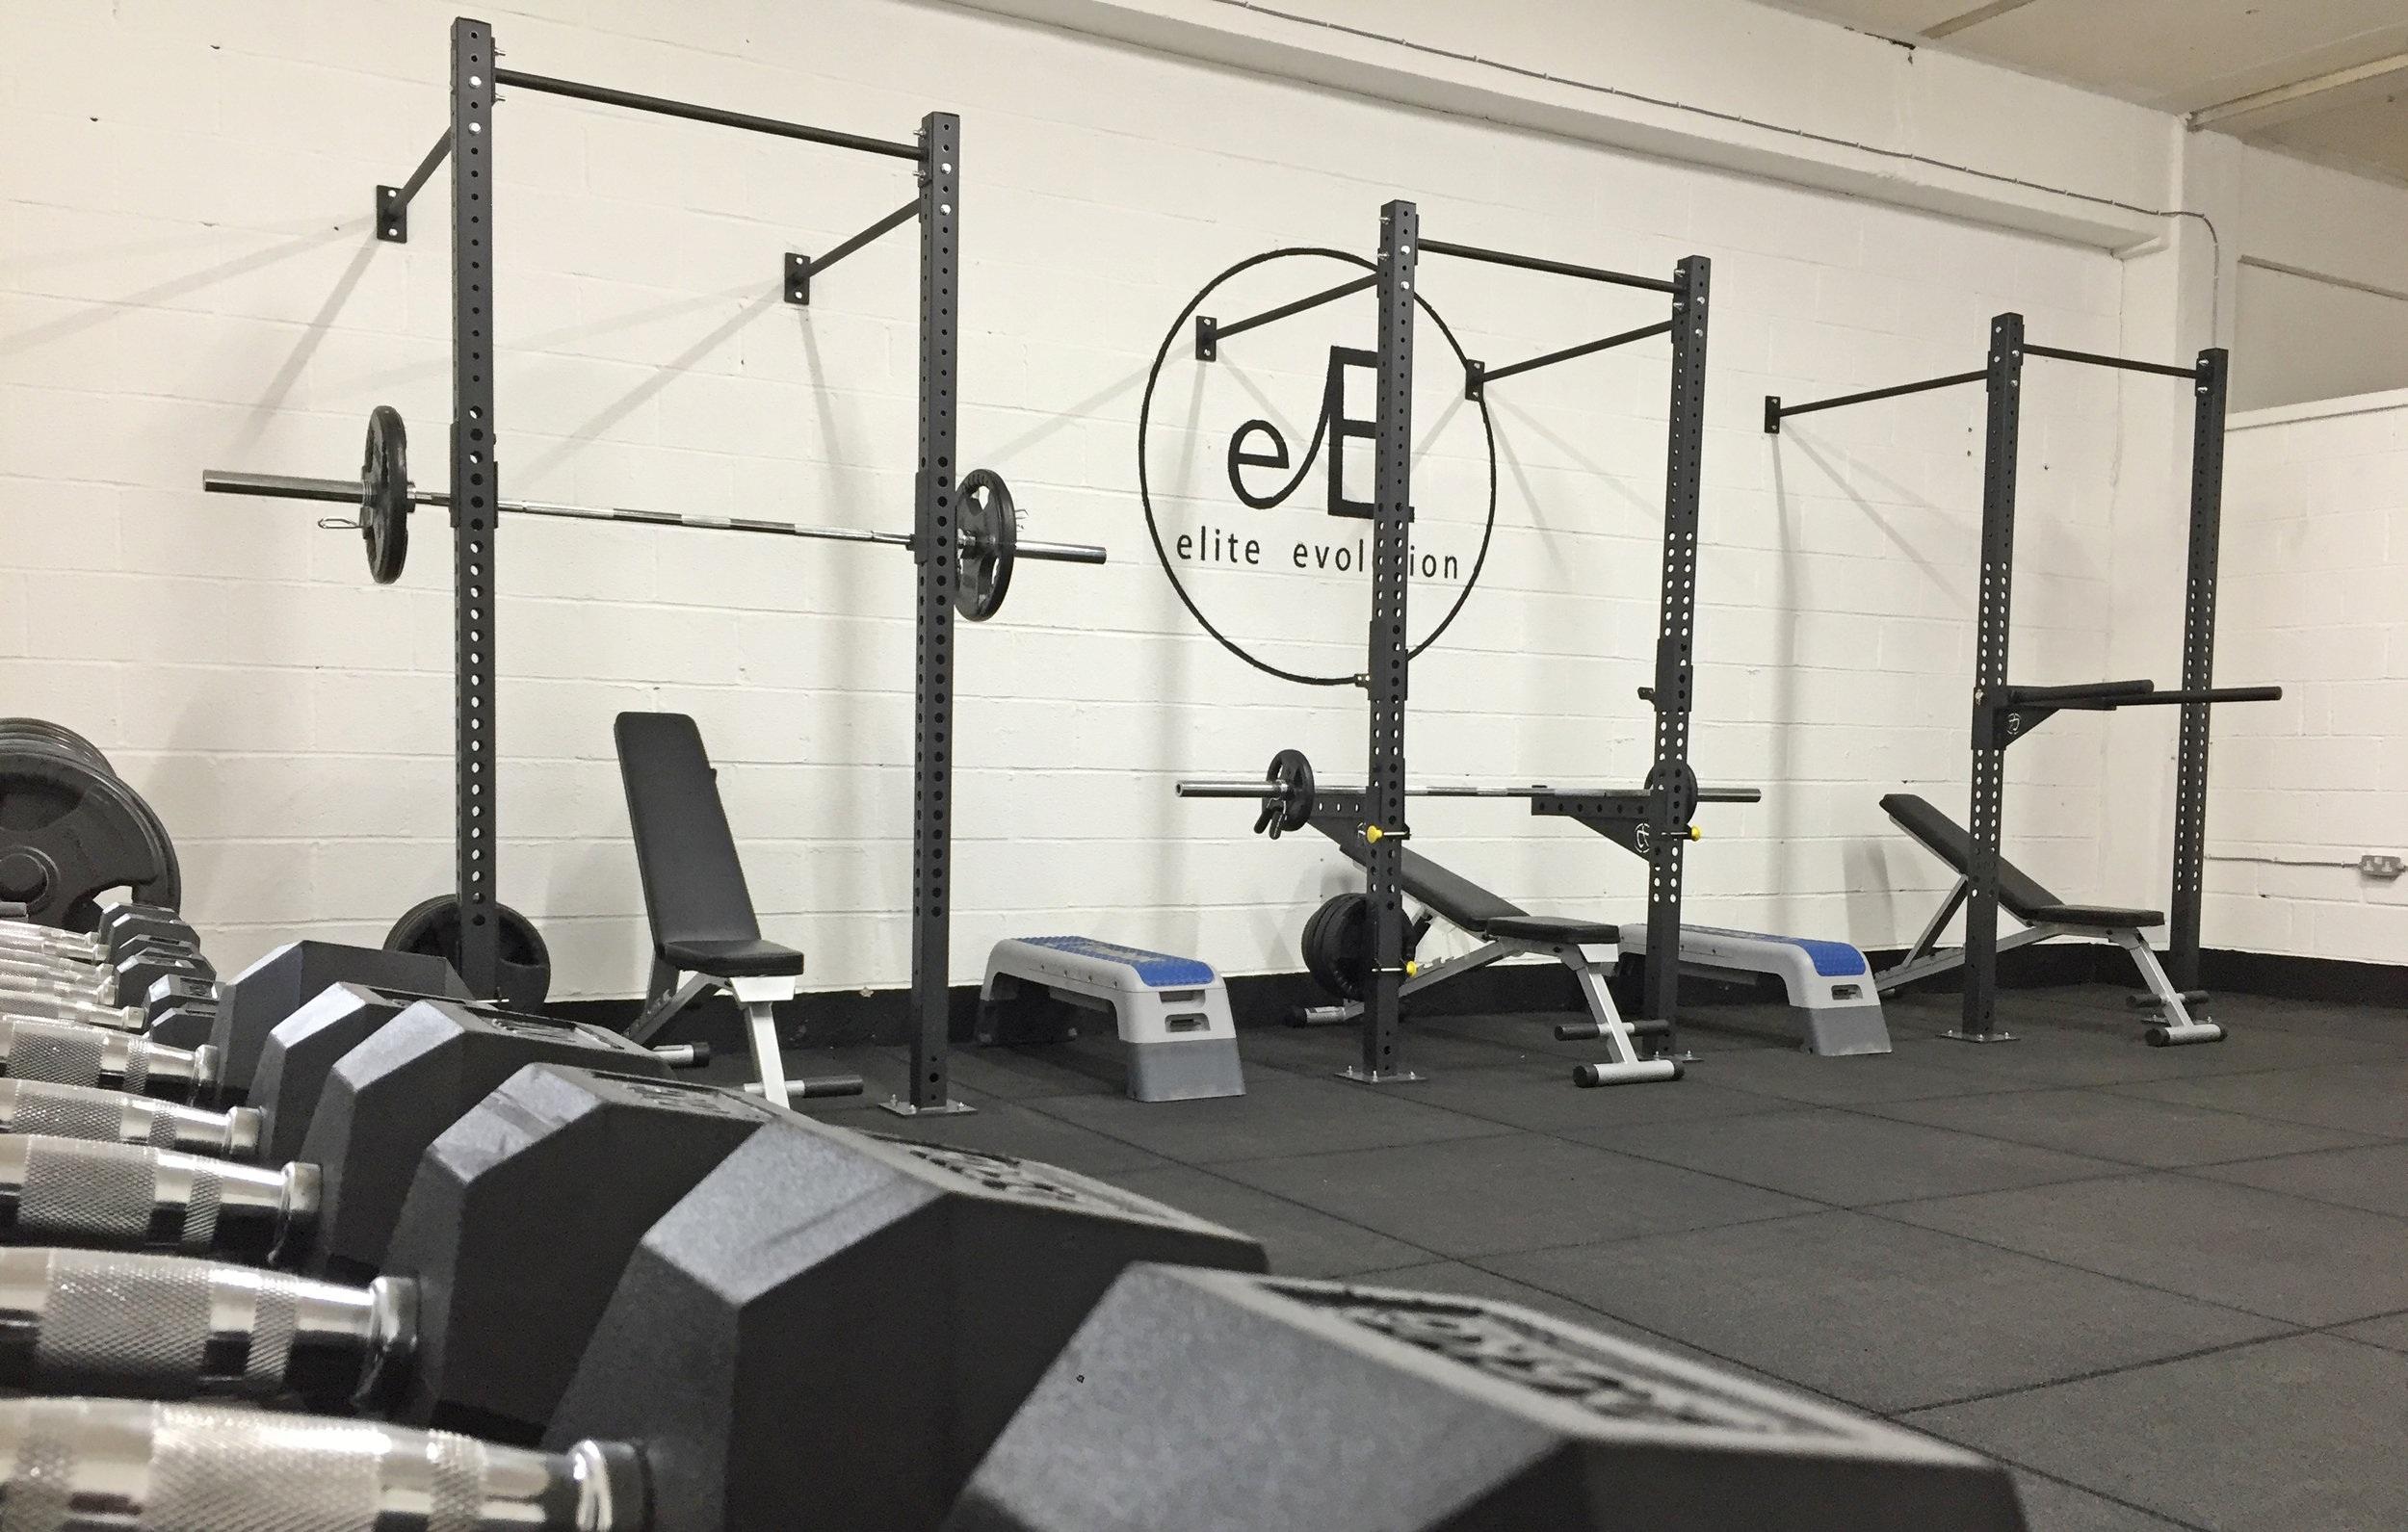 elite evolution - Tuesdays & Thursdays 7.30-9.00pm